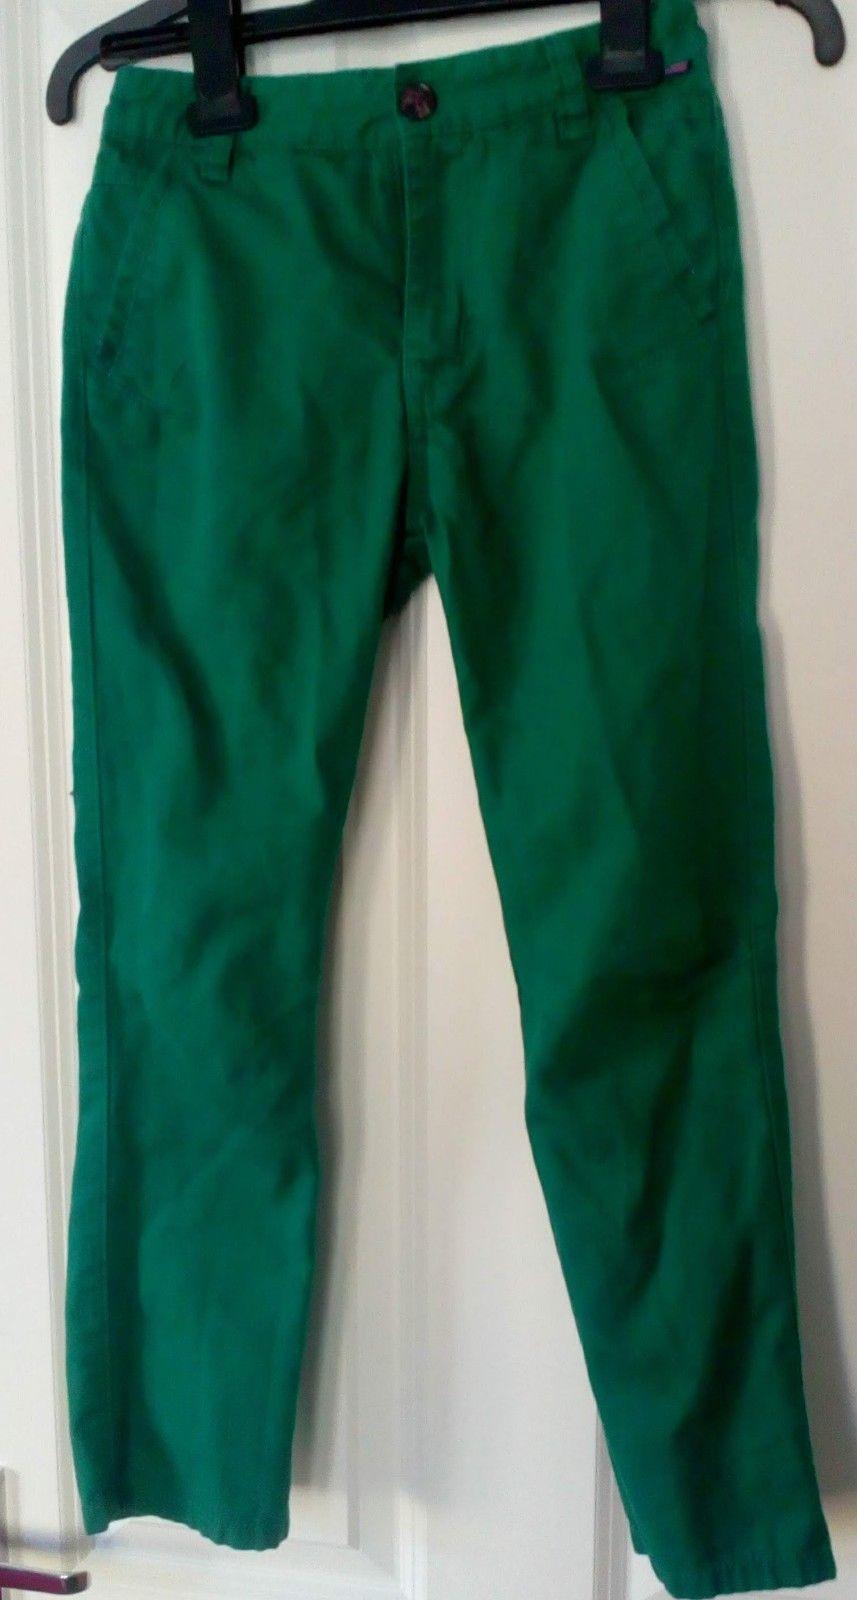 200ec89d1 Baker by Ted Baker - Trousers - Age 9 (134 cm) - Green - Debenhams ...